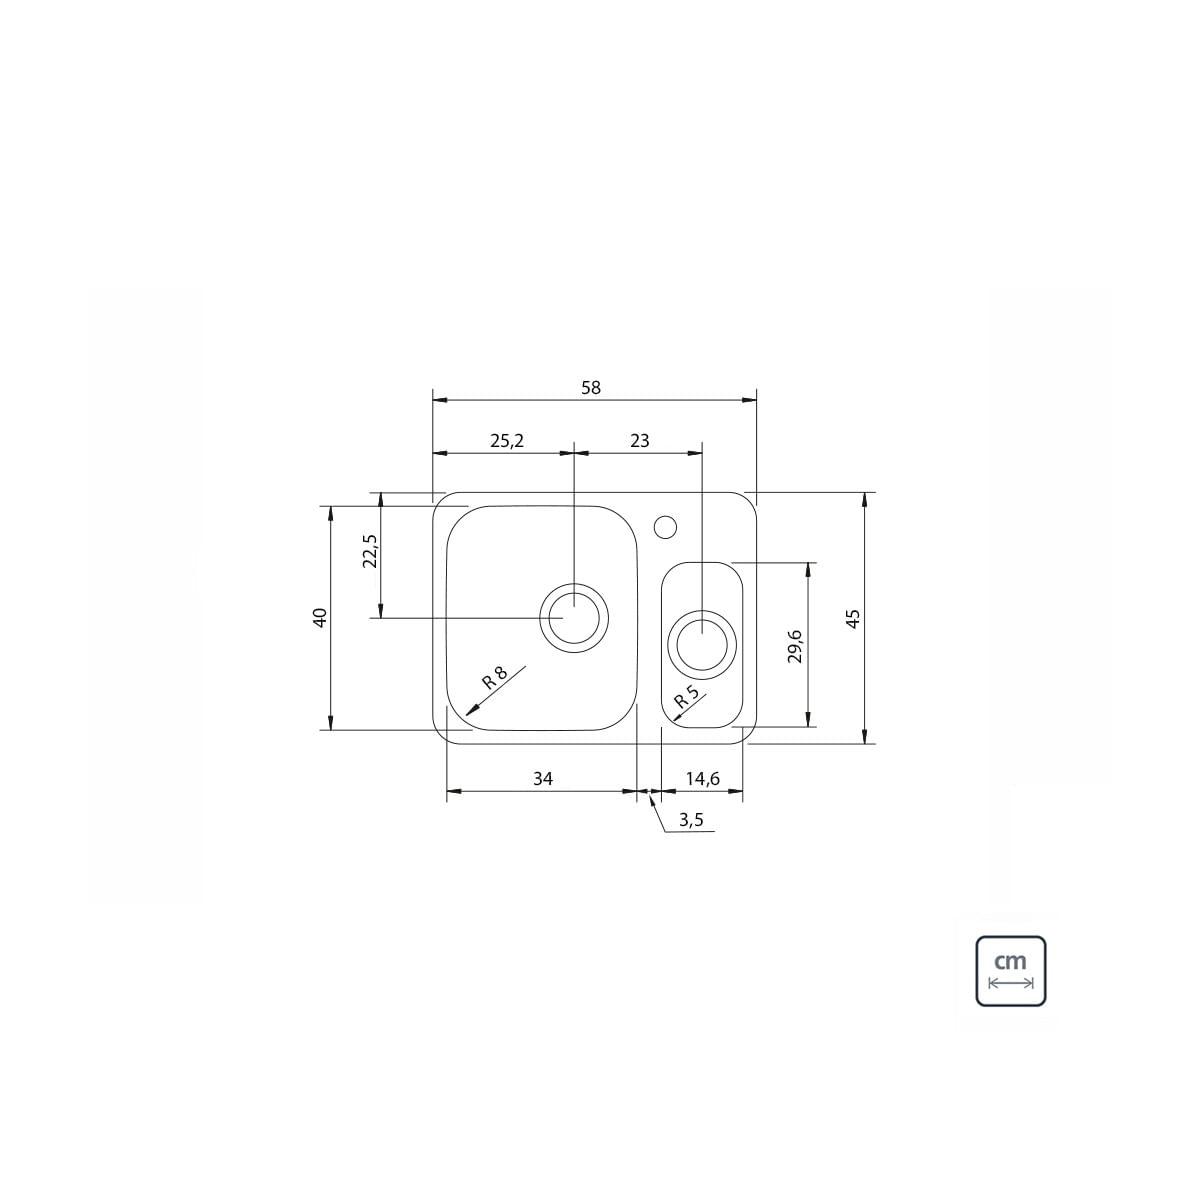 Cuba Tramontina Isis Plus em aço inox Acetinado 58 x 45 cm com válvula 94036122